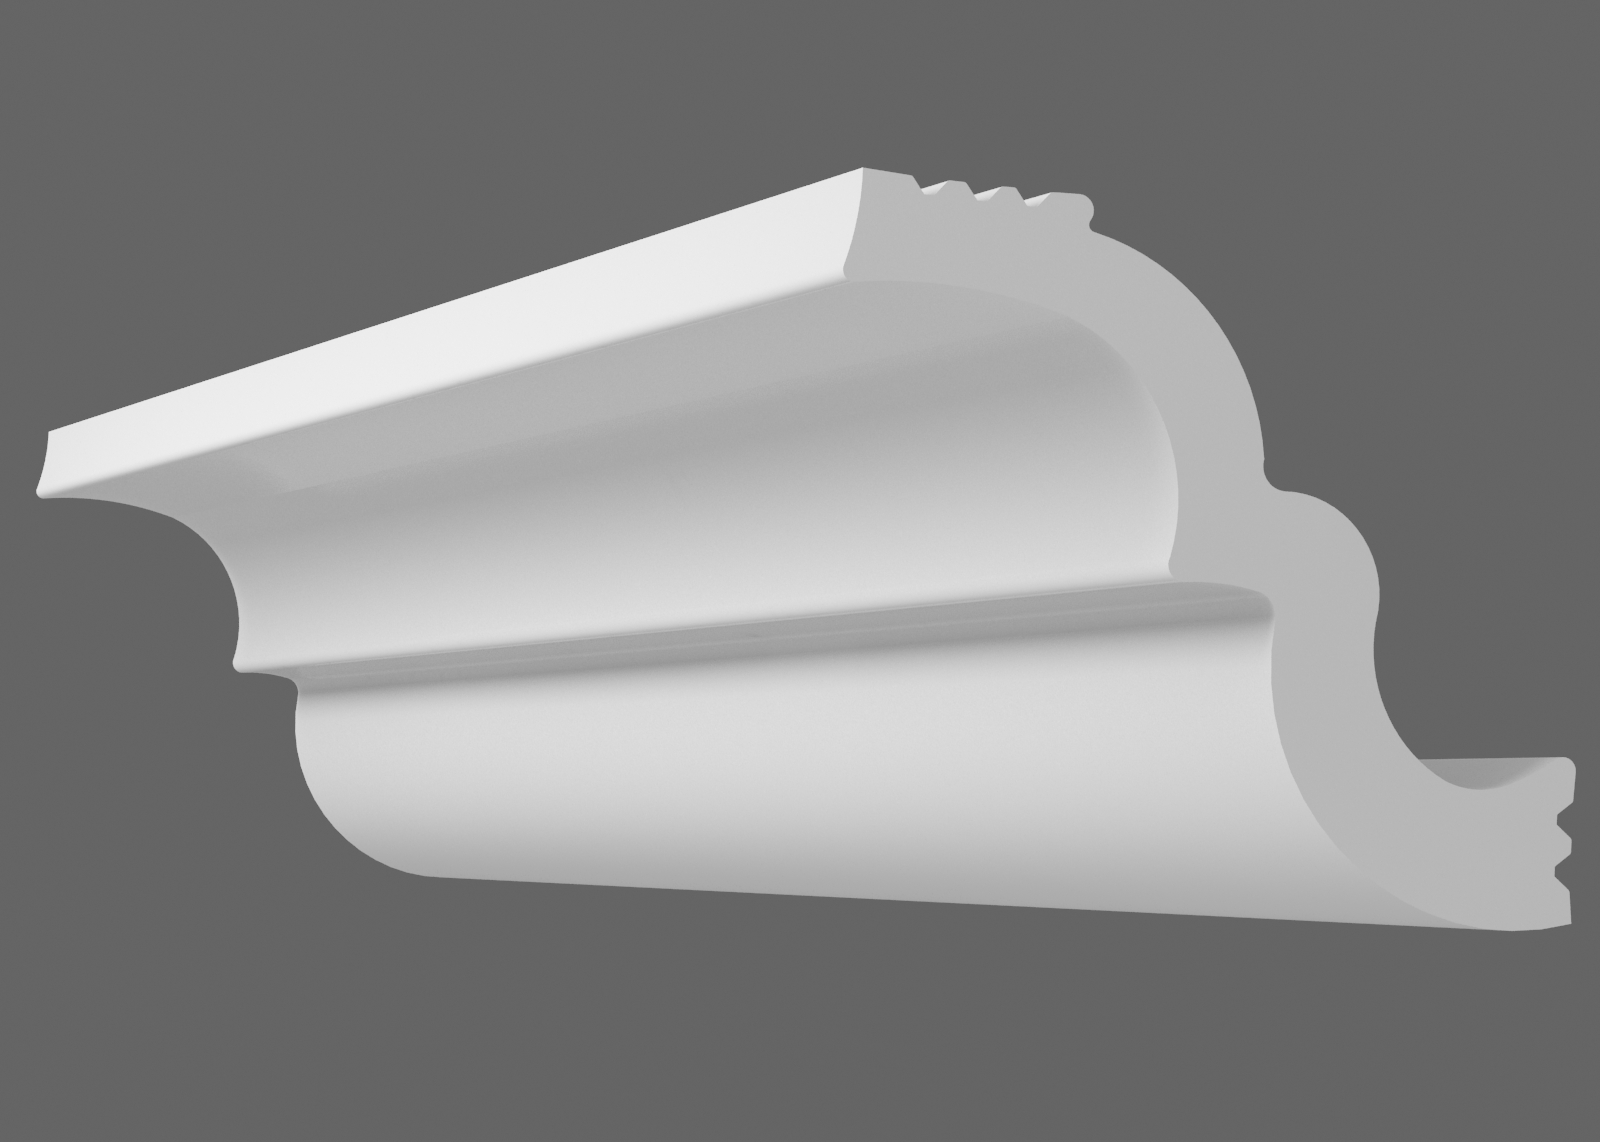 Потолочный плинтус S-40 (Размер:30х30мм)